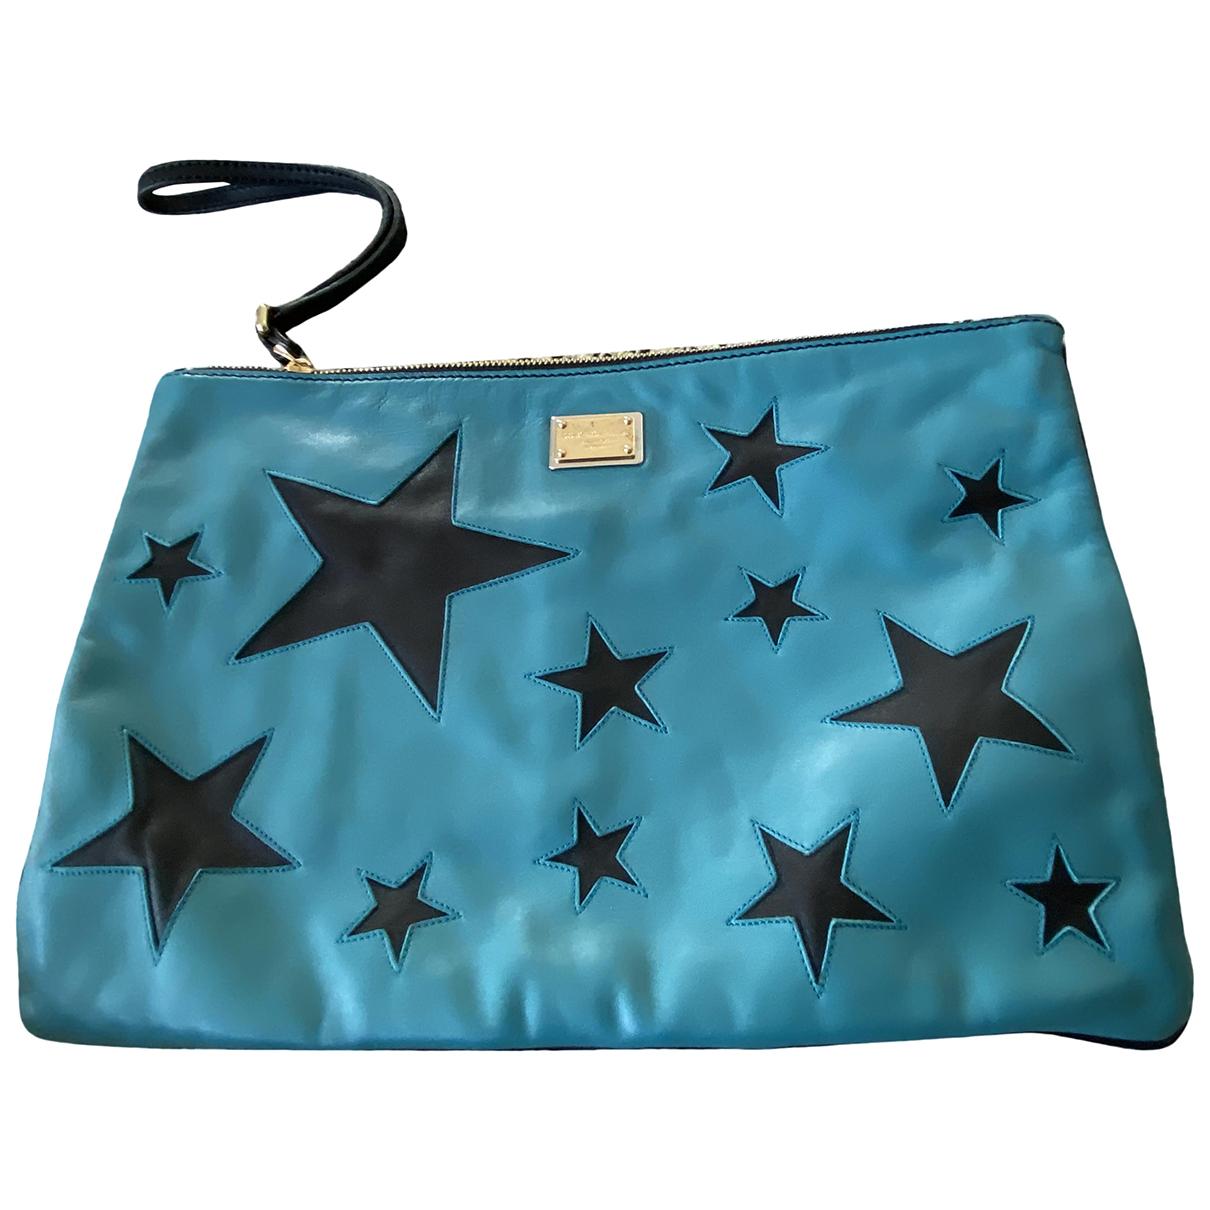 Dolce & Gabbana \N Blue Leather Clutch bag for Women \N